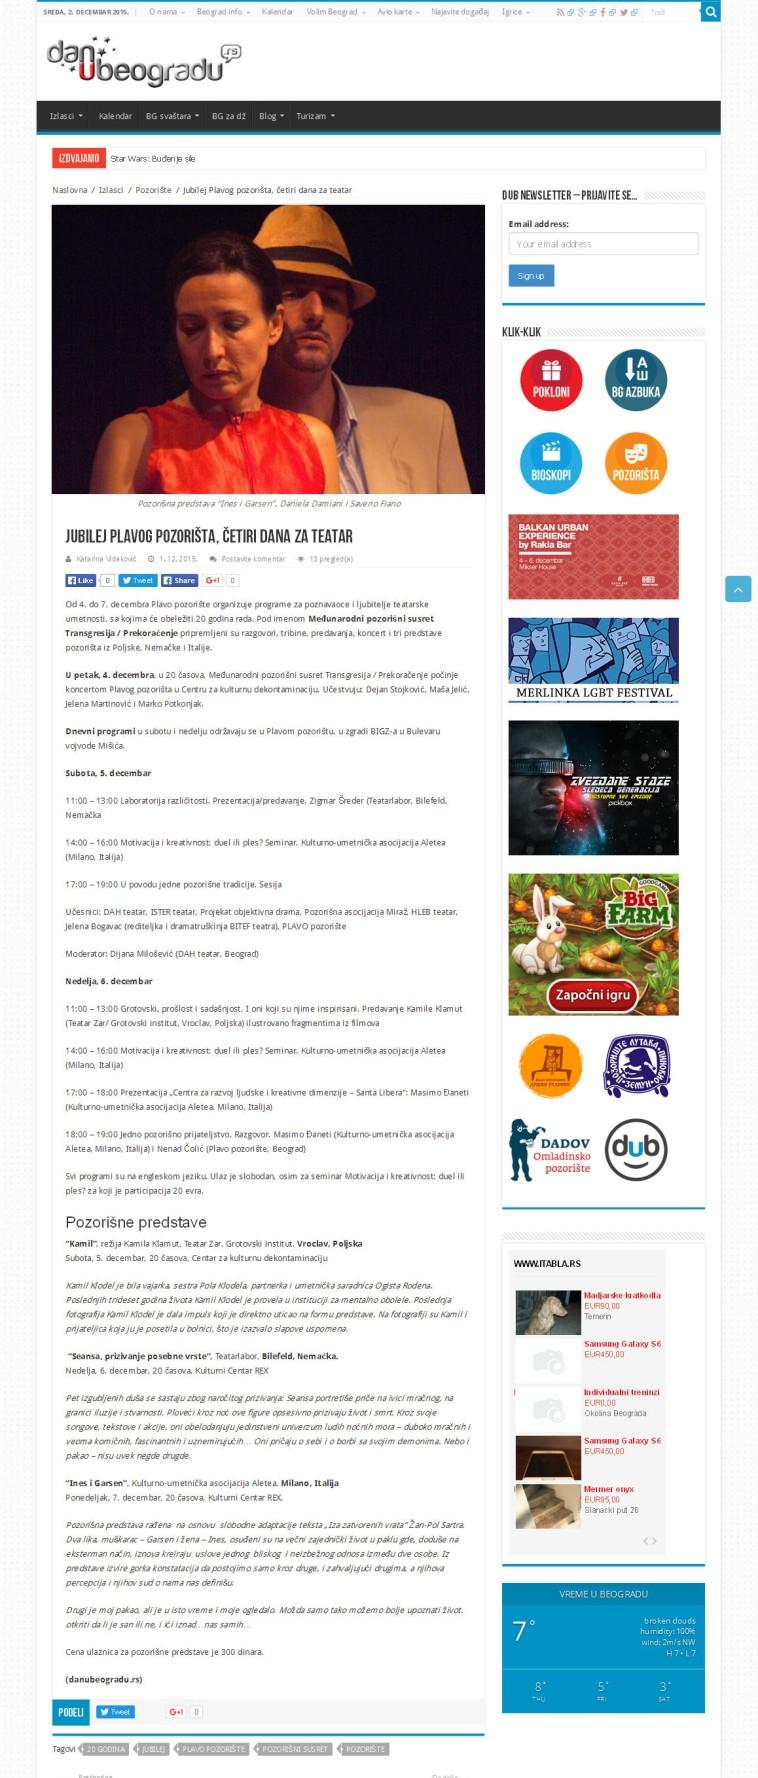 0112 - danubeogradu.rs - Jubilej Plavog pozorista, cetiri dana za teatar